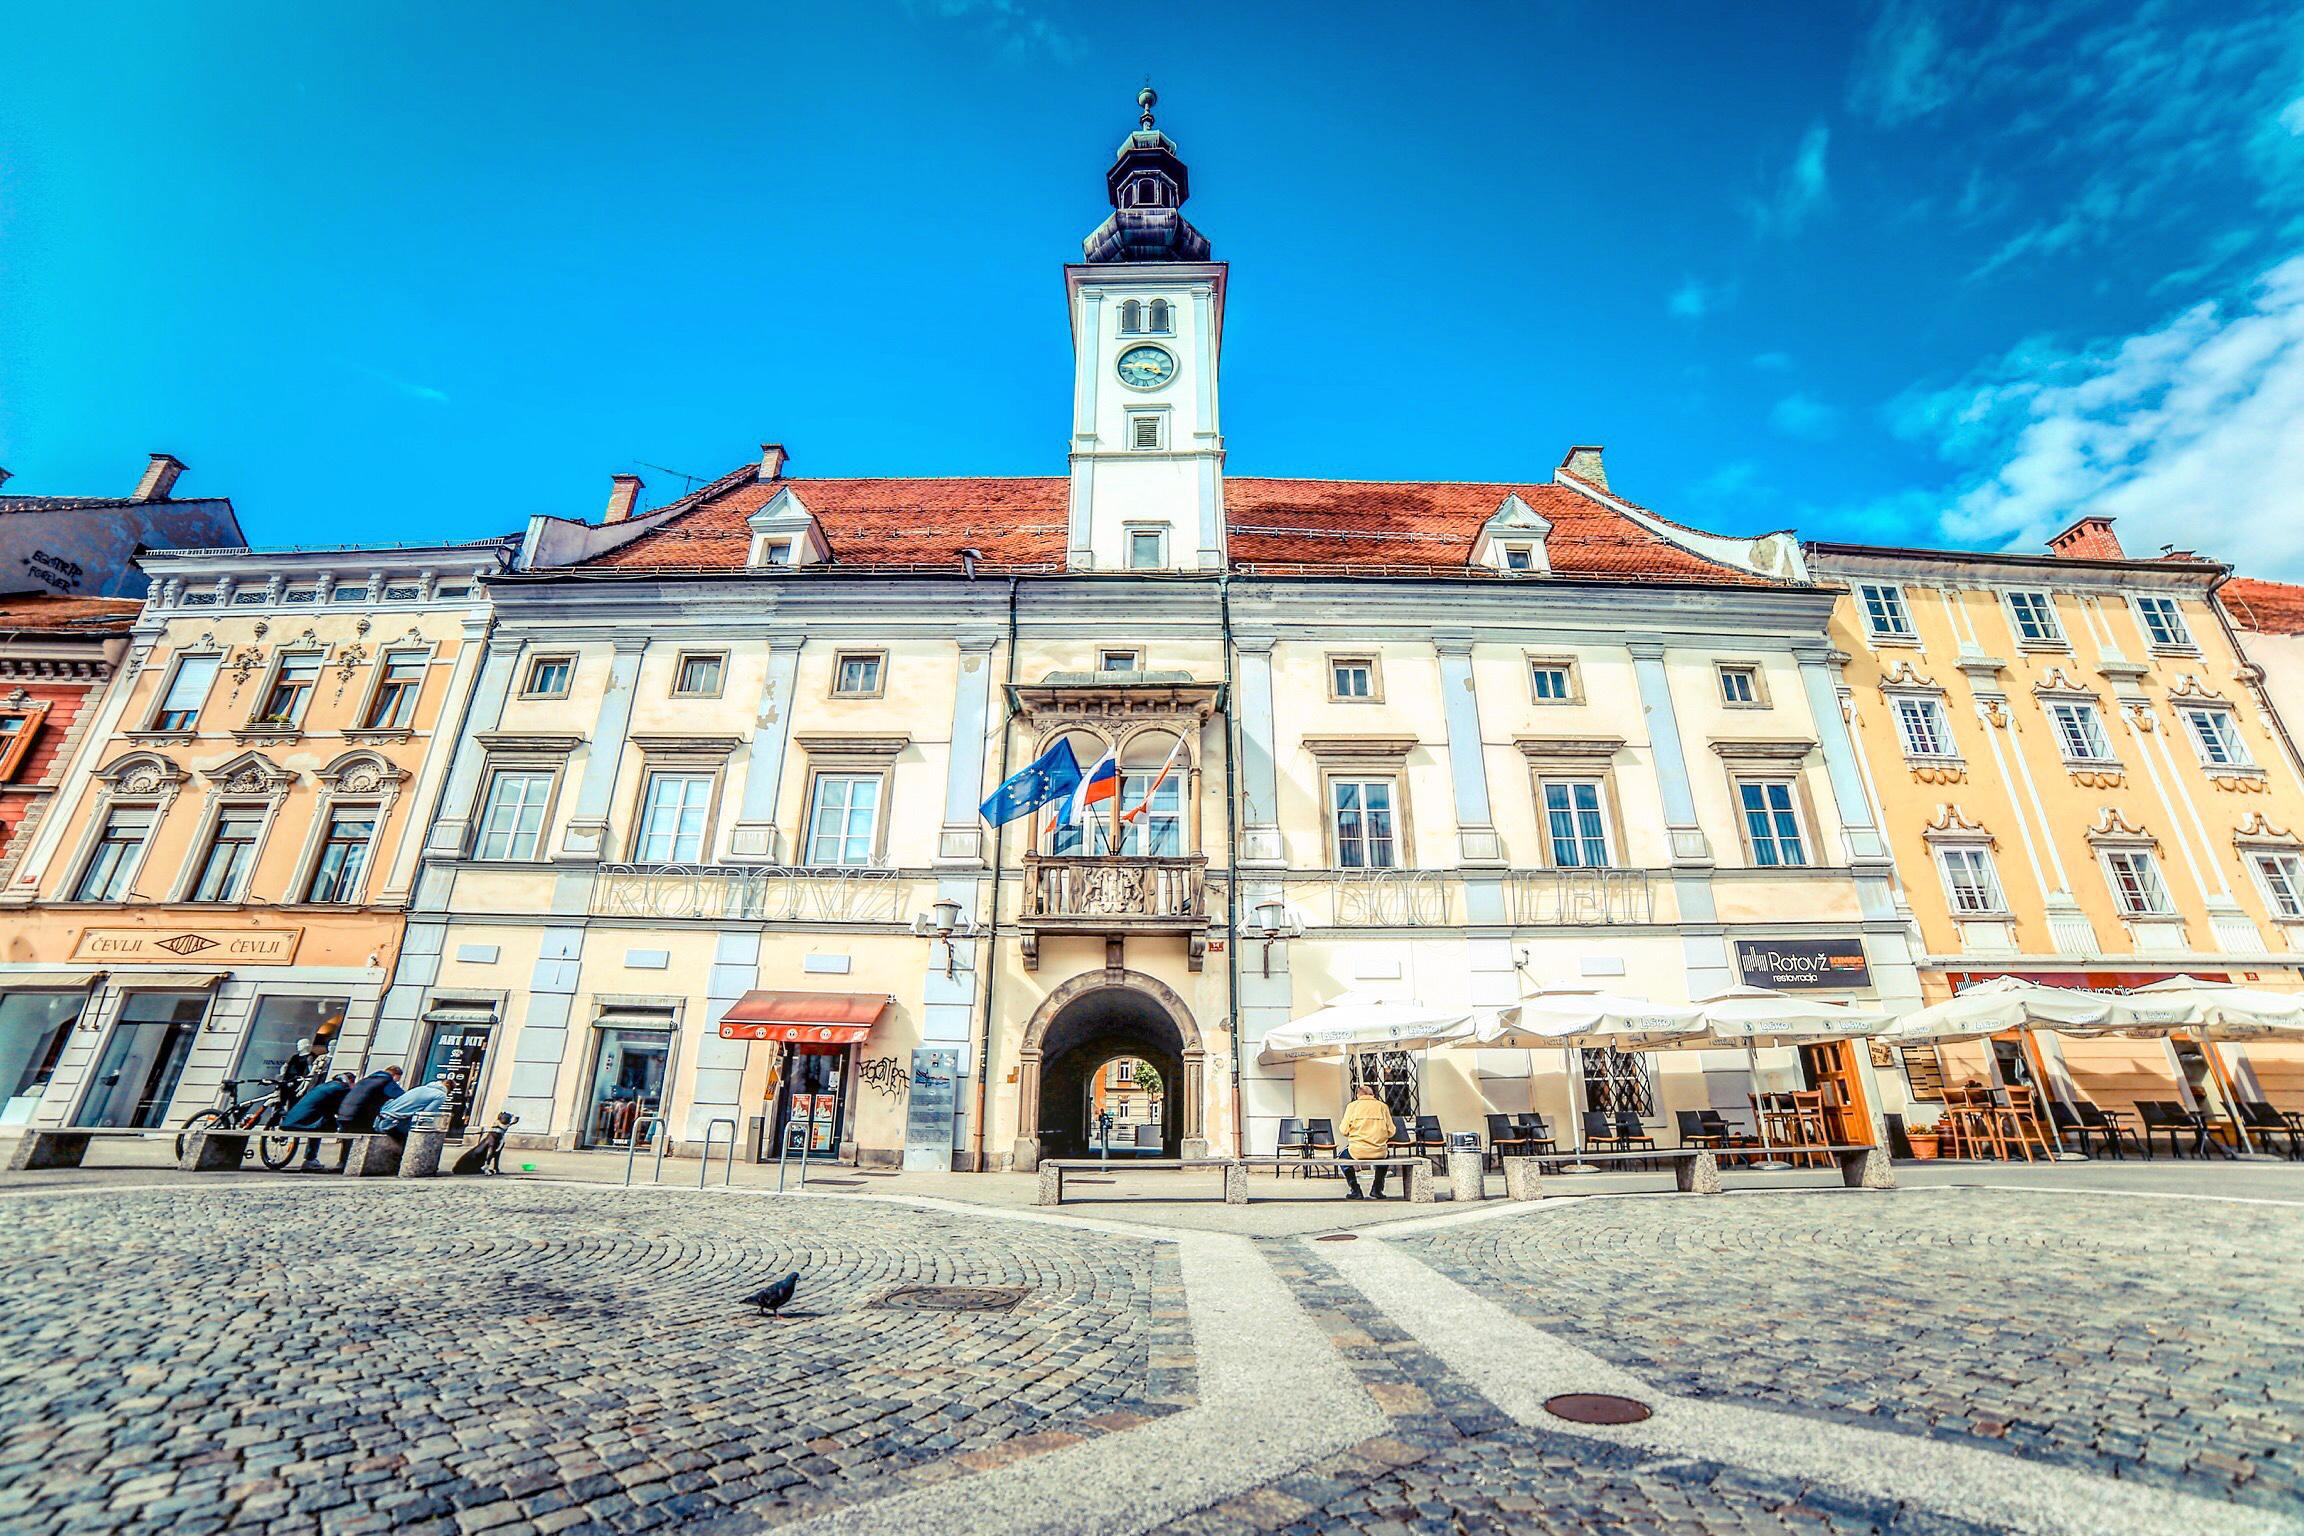 Pomladni_Maribor-14.jpg